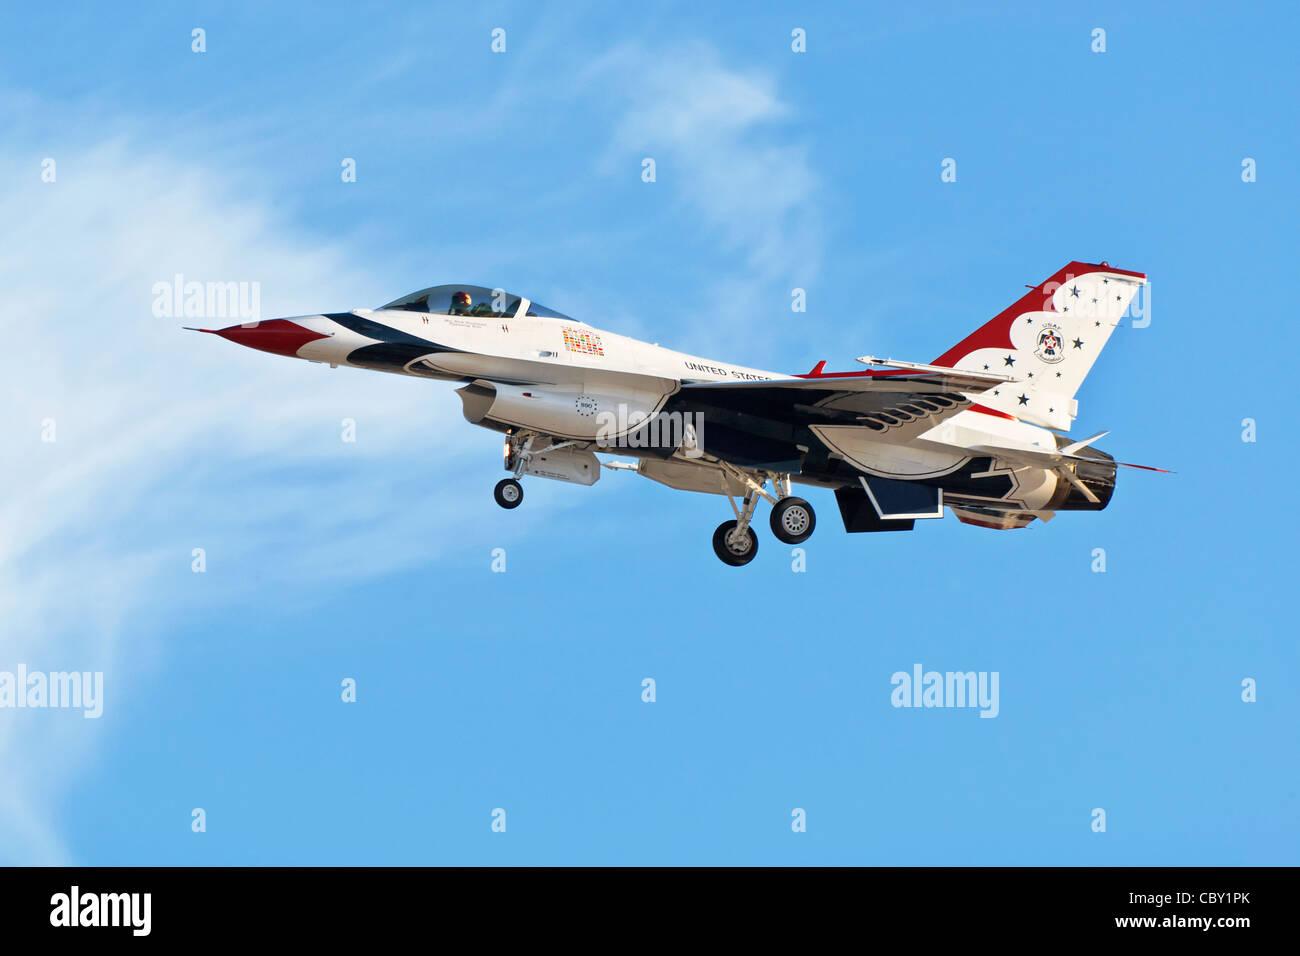 General Dynamics F16 Fighting Falcon Immagini Stock